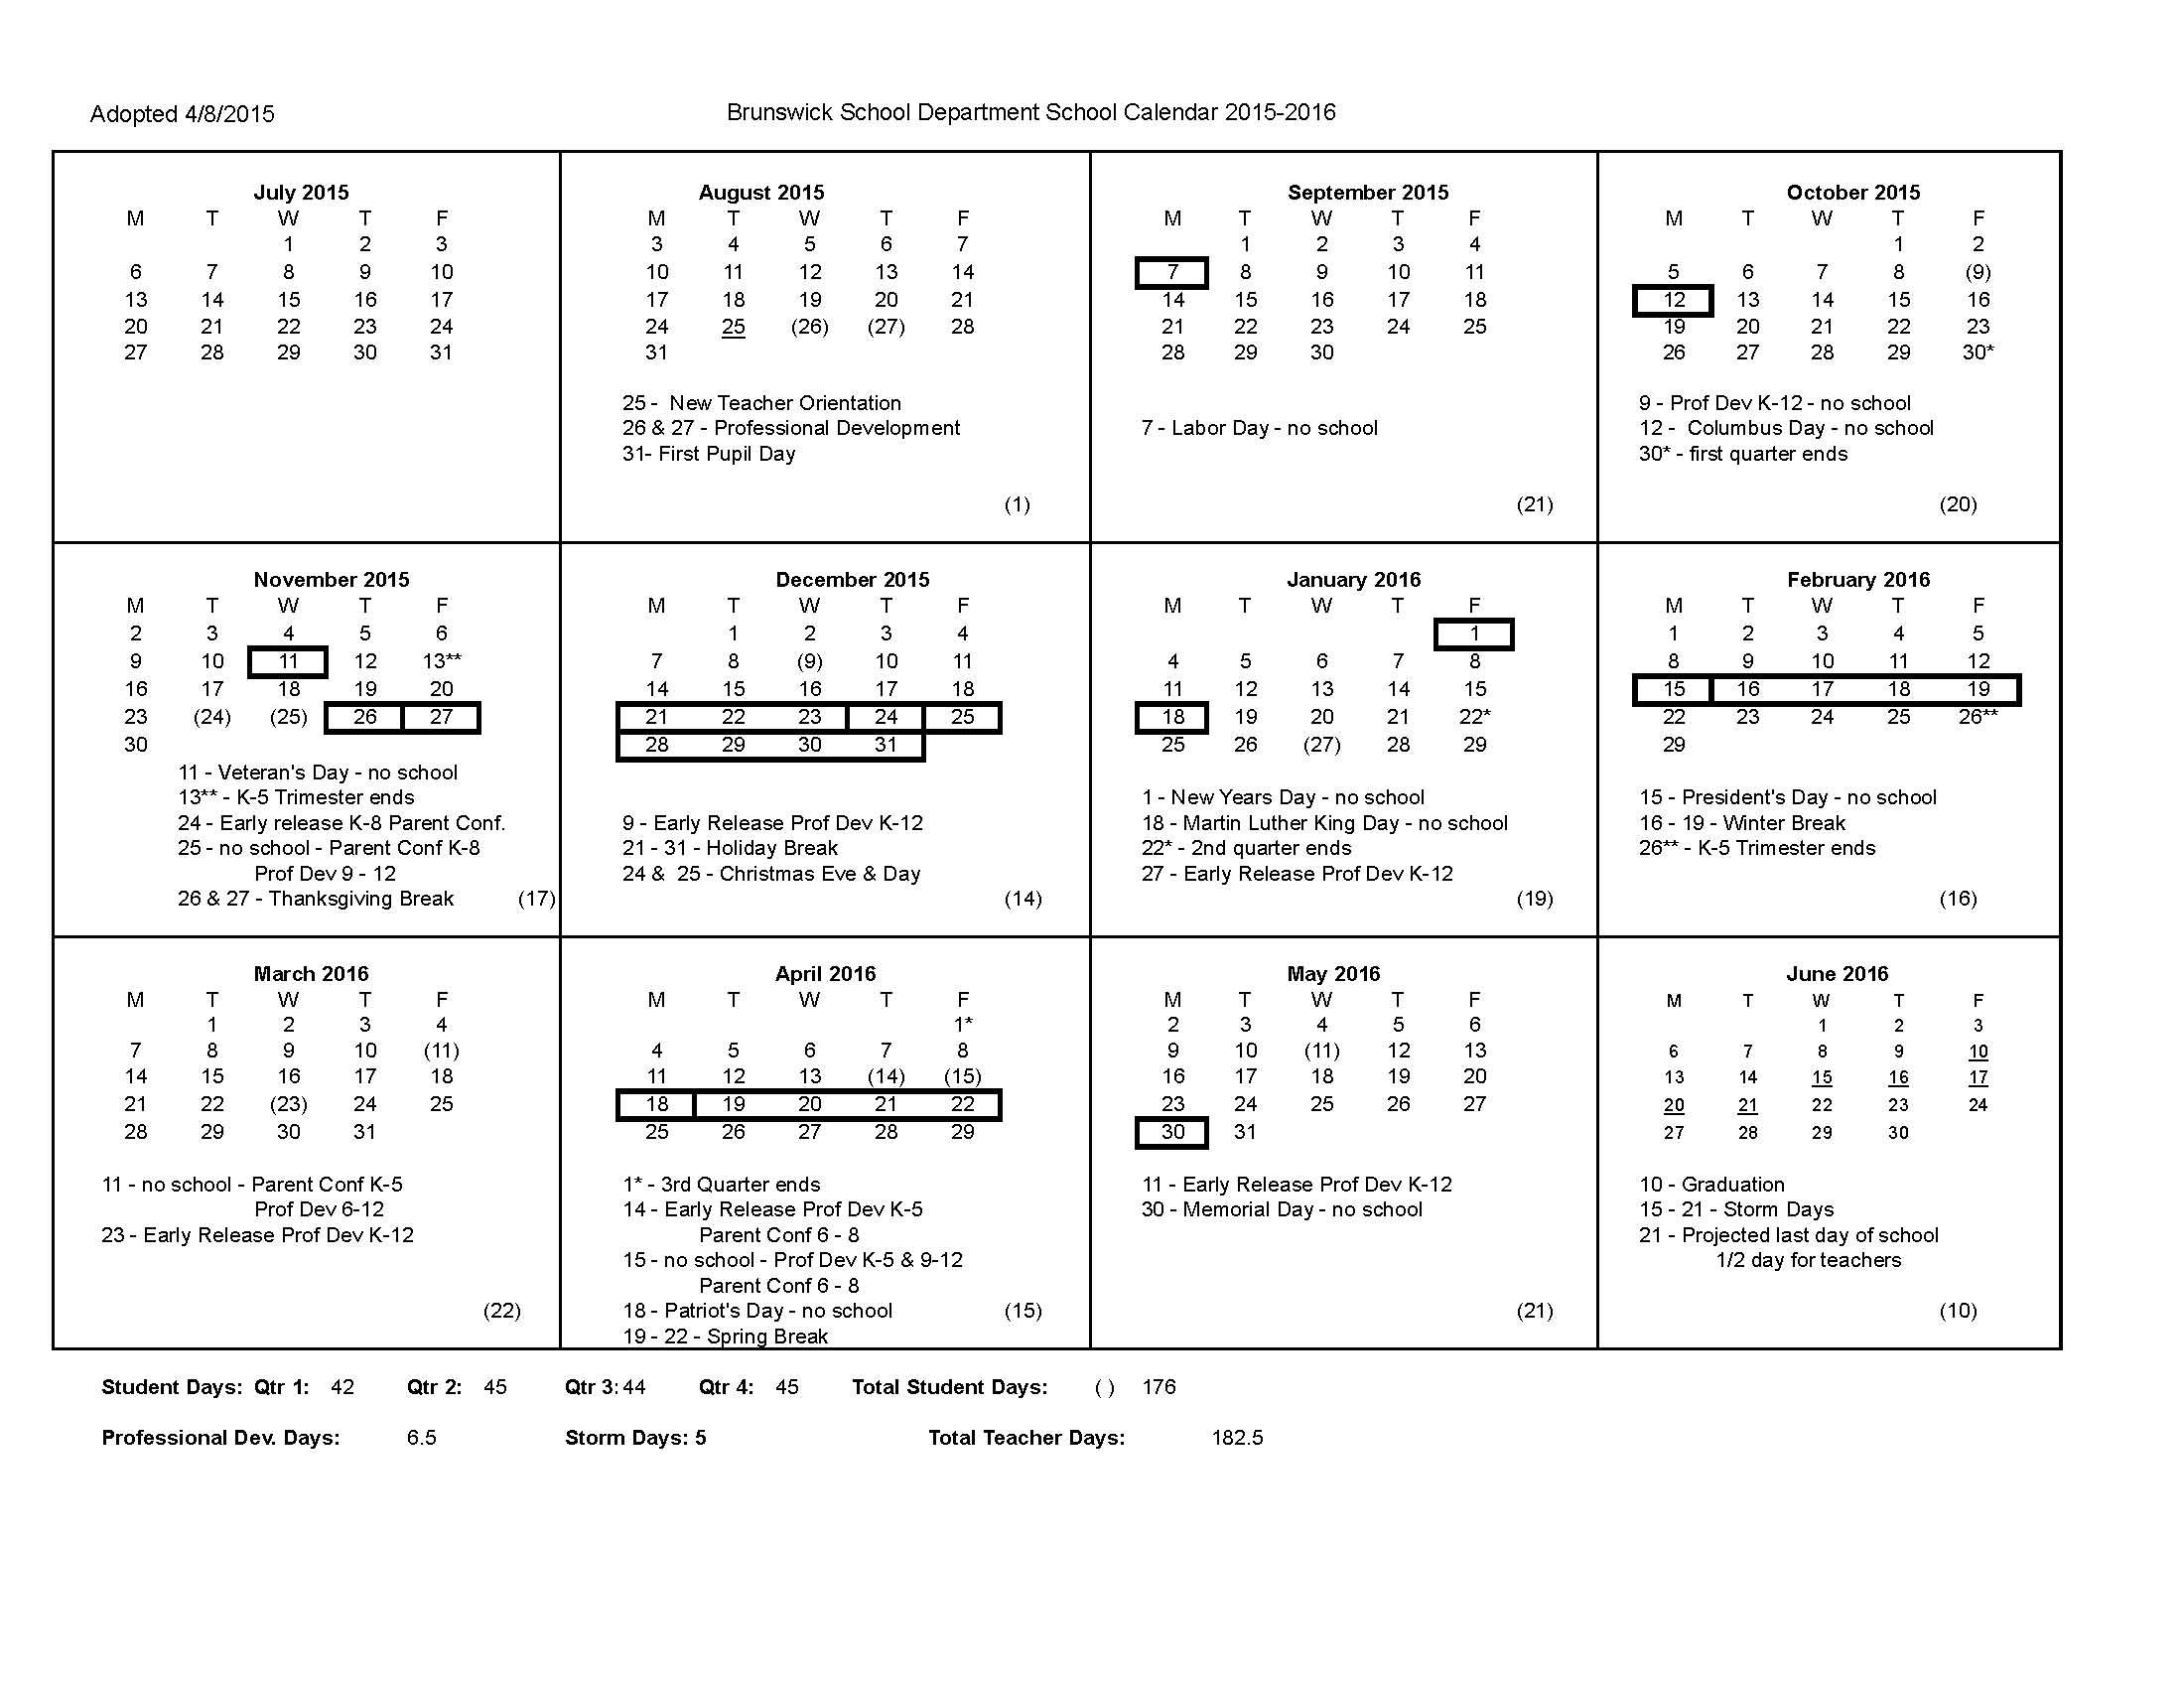 Adopted Calendar 20152016V1  Brunswick School Department for Uti School Calendar